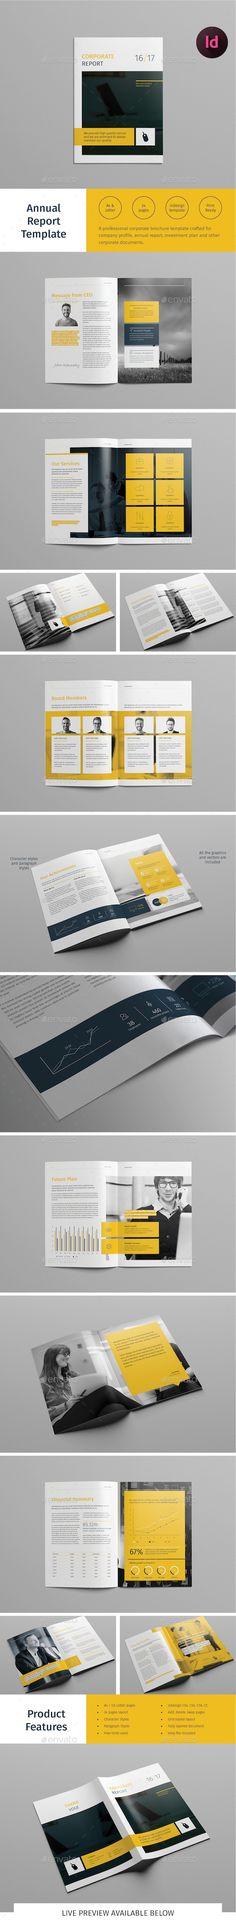 Report Template - #Informational #Brochures Download here: https://graphicriver.net/item/report-template/20080121?ref=alena994